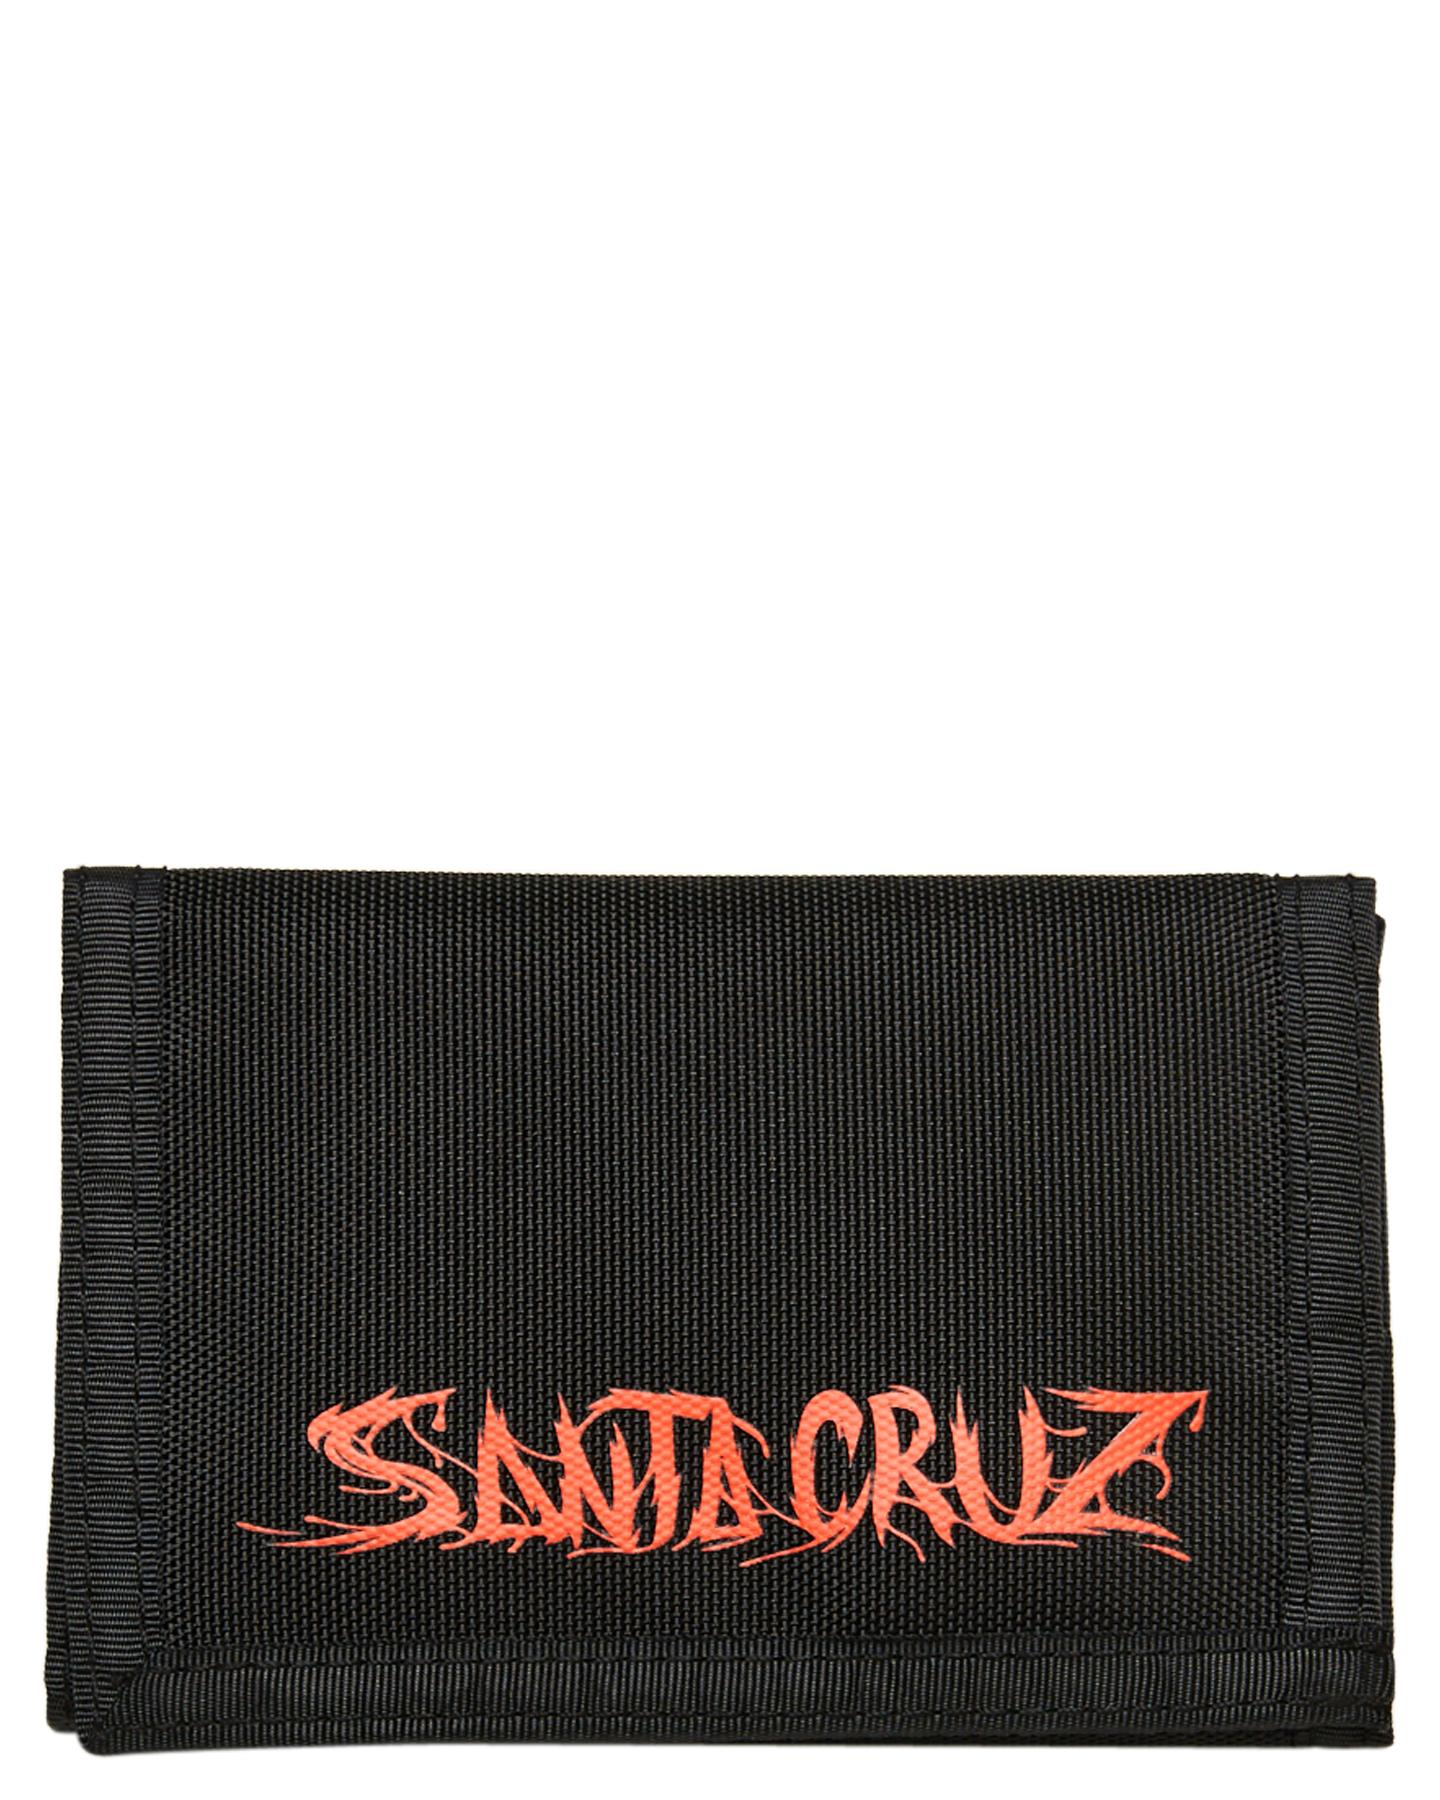 Santa Cruz Boys Rat Slasher Velcro Wallet Black